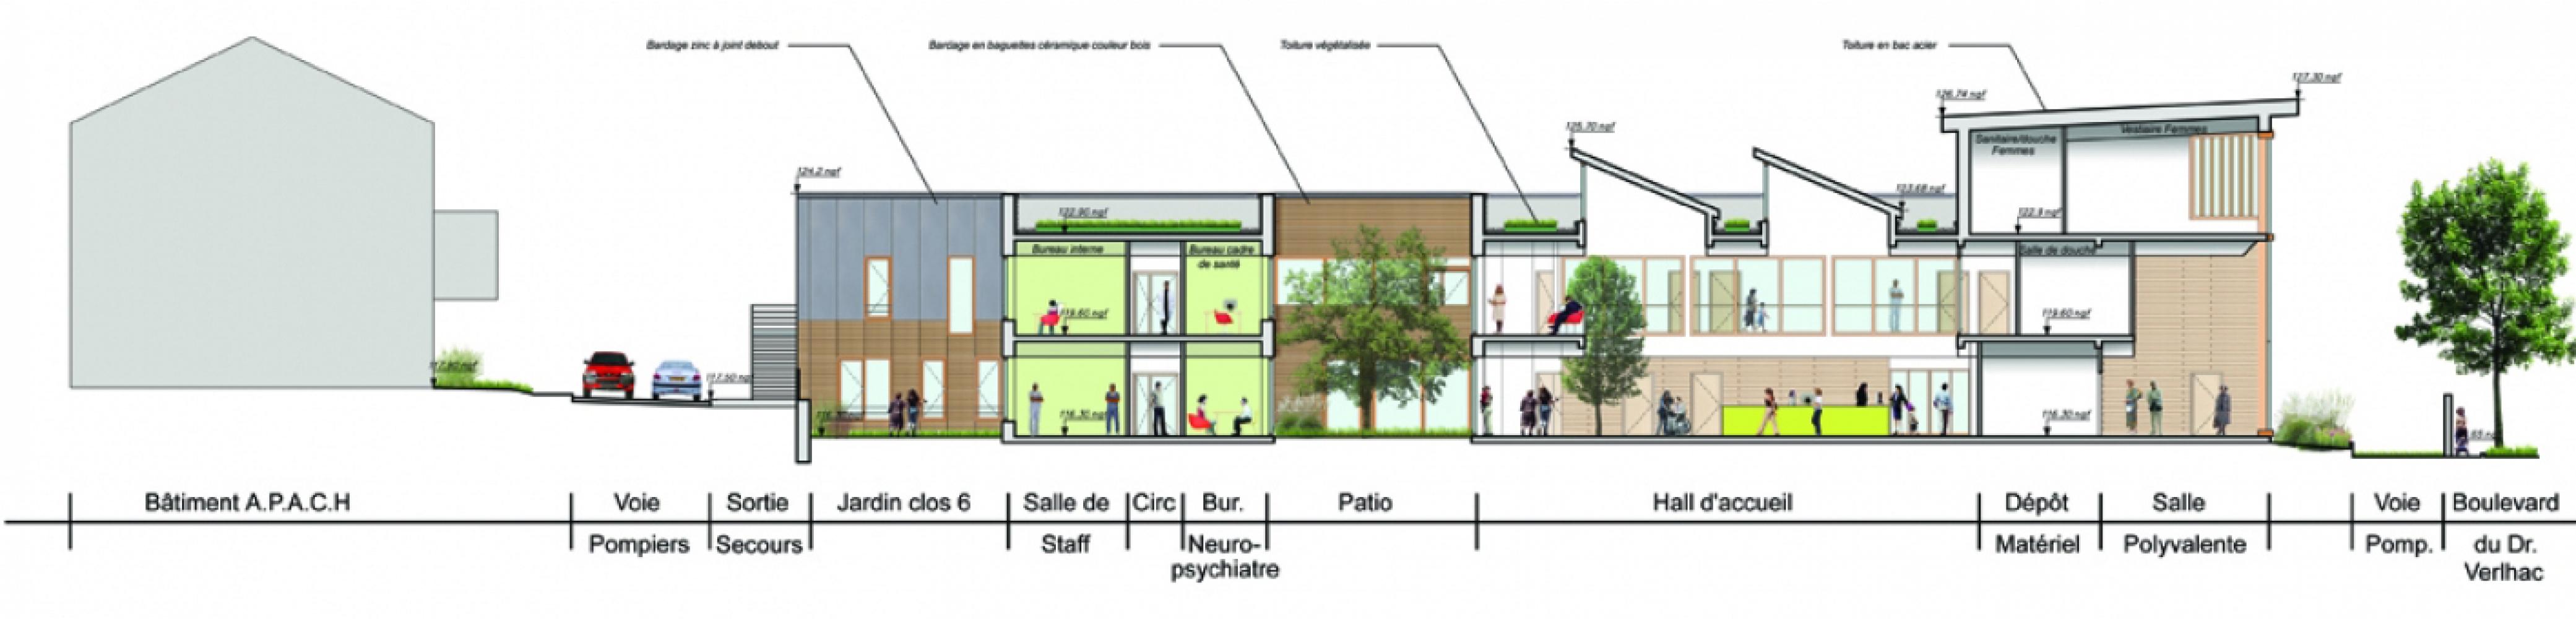 brive03 Pascale SEURIN Architecte - Pascale SEURIN Architecte